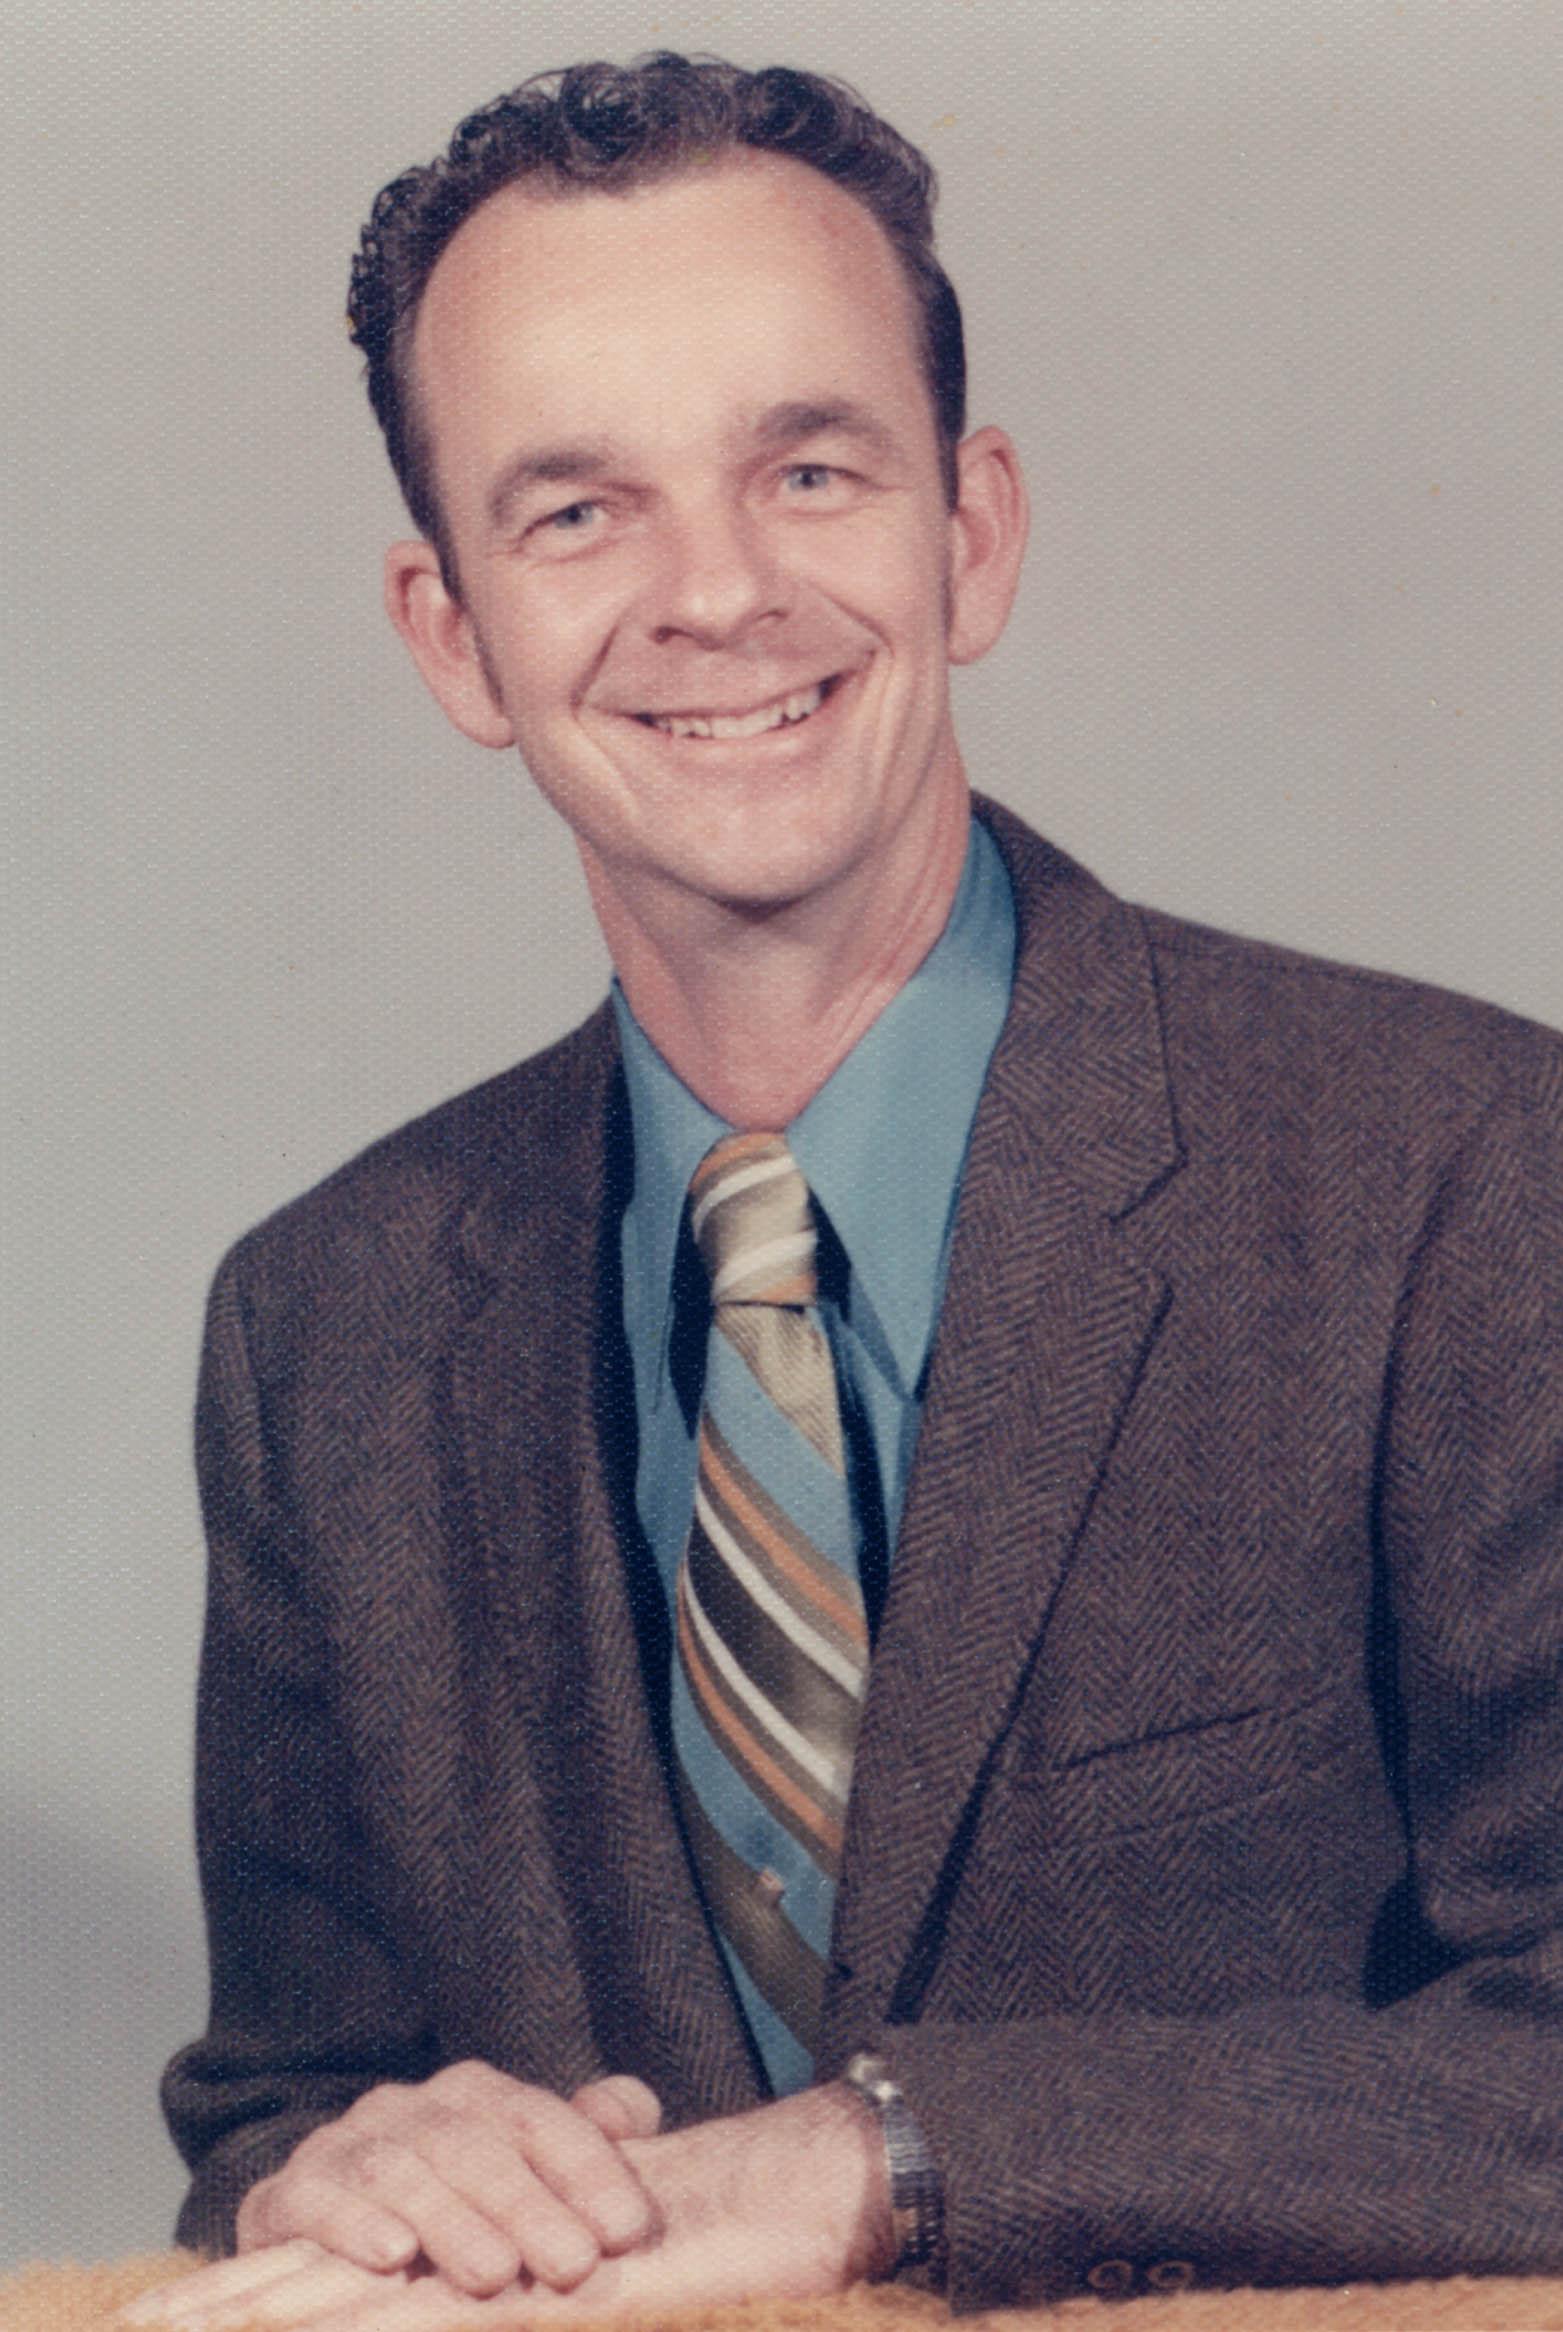 Mr. Carnahan